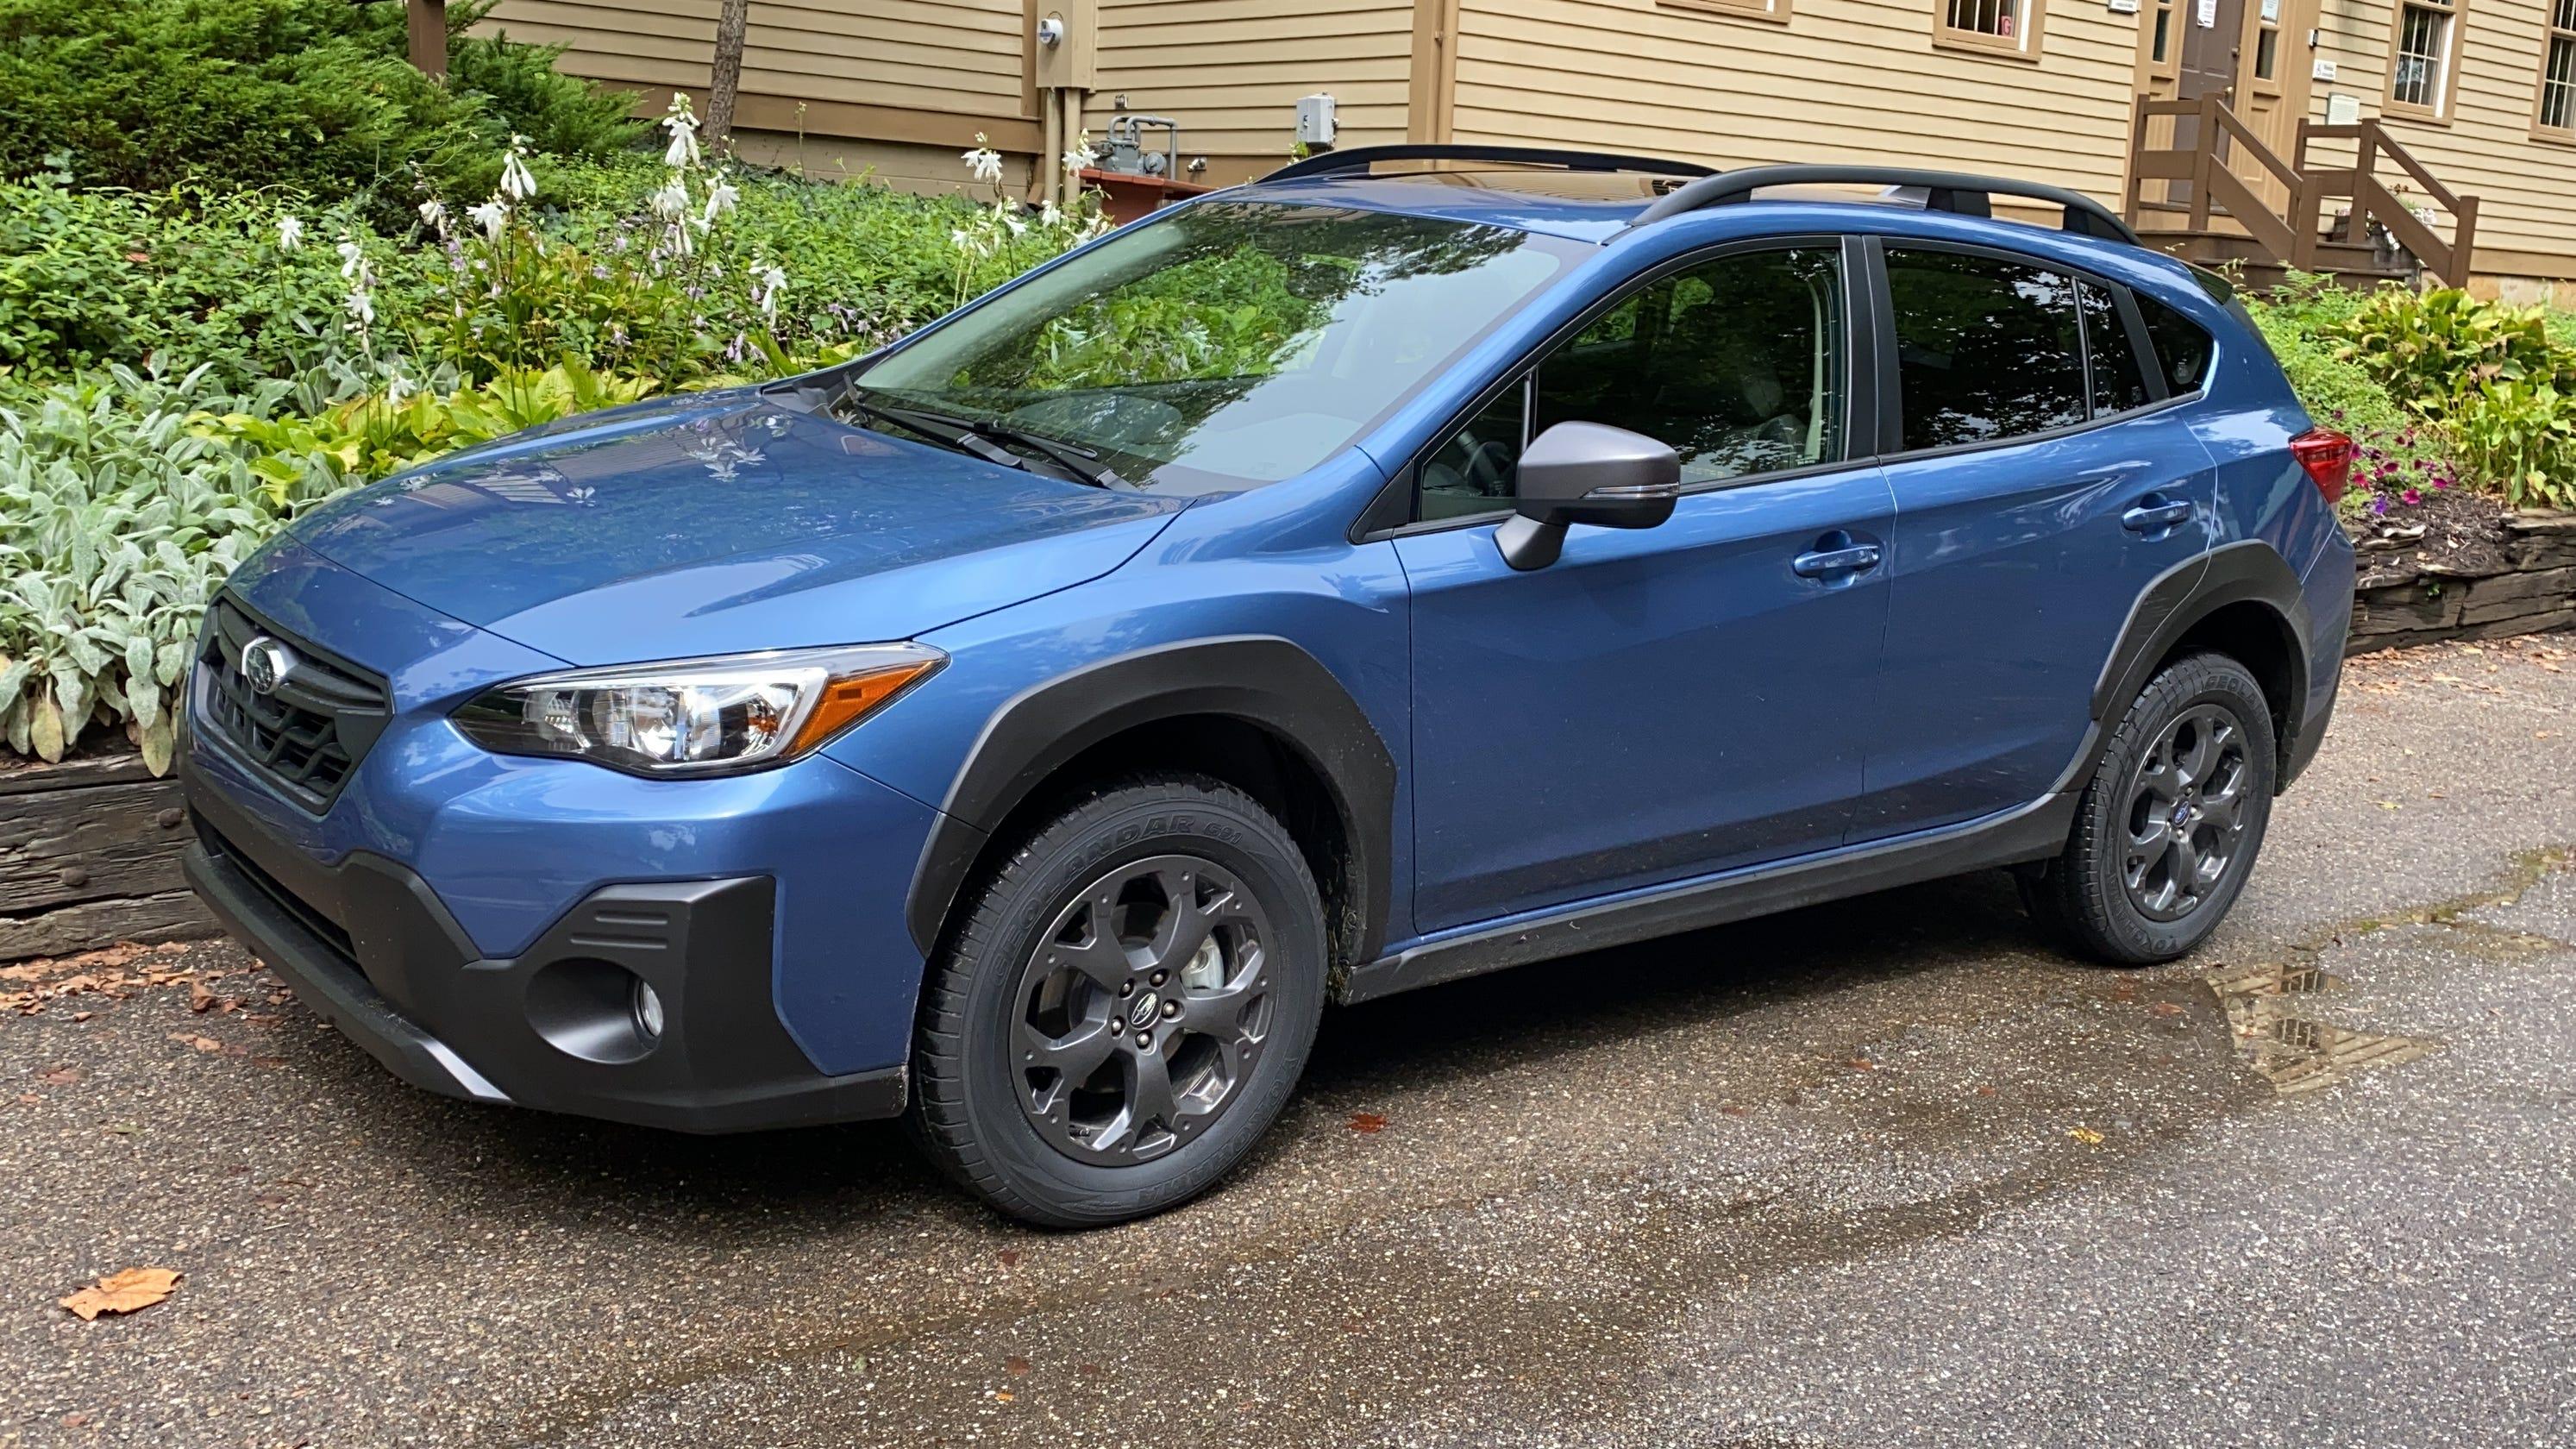 2021 Subaru Crosstrek small SUV powers up to take on new rivals